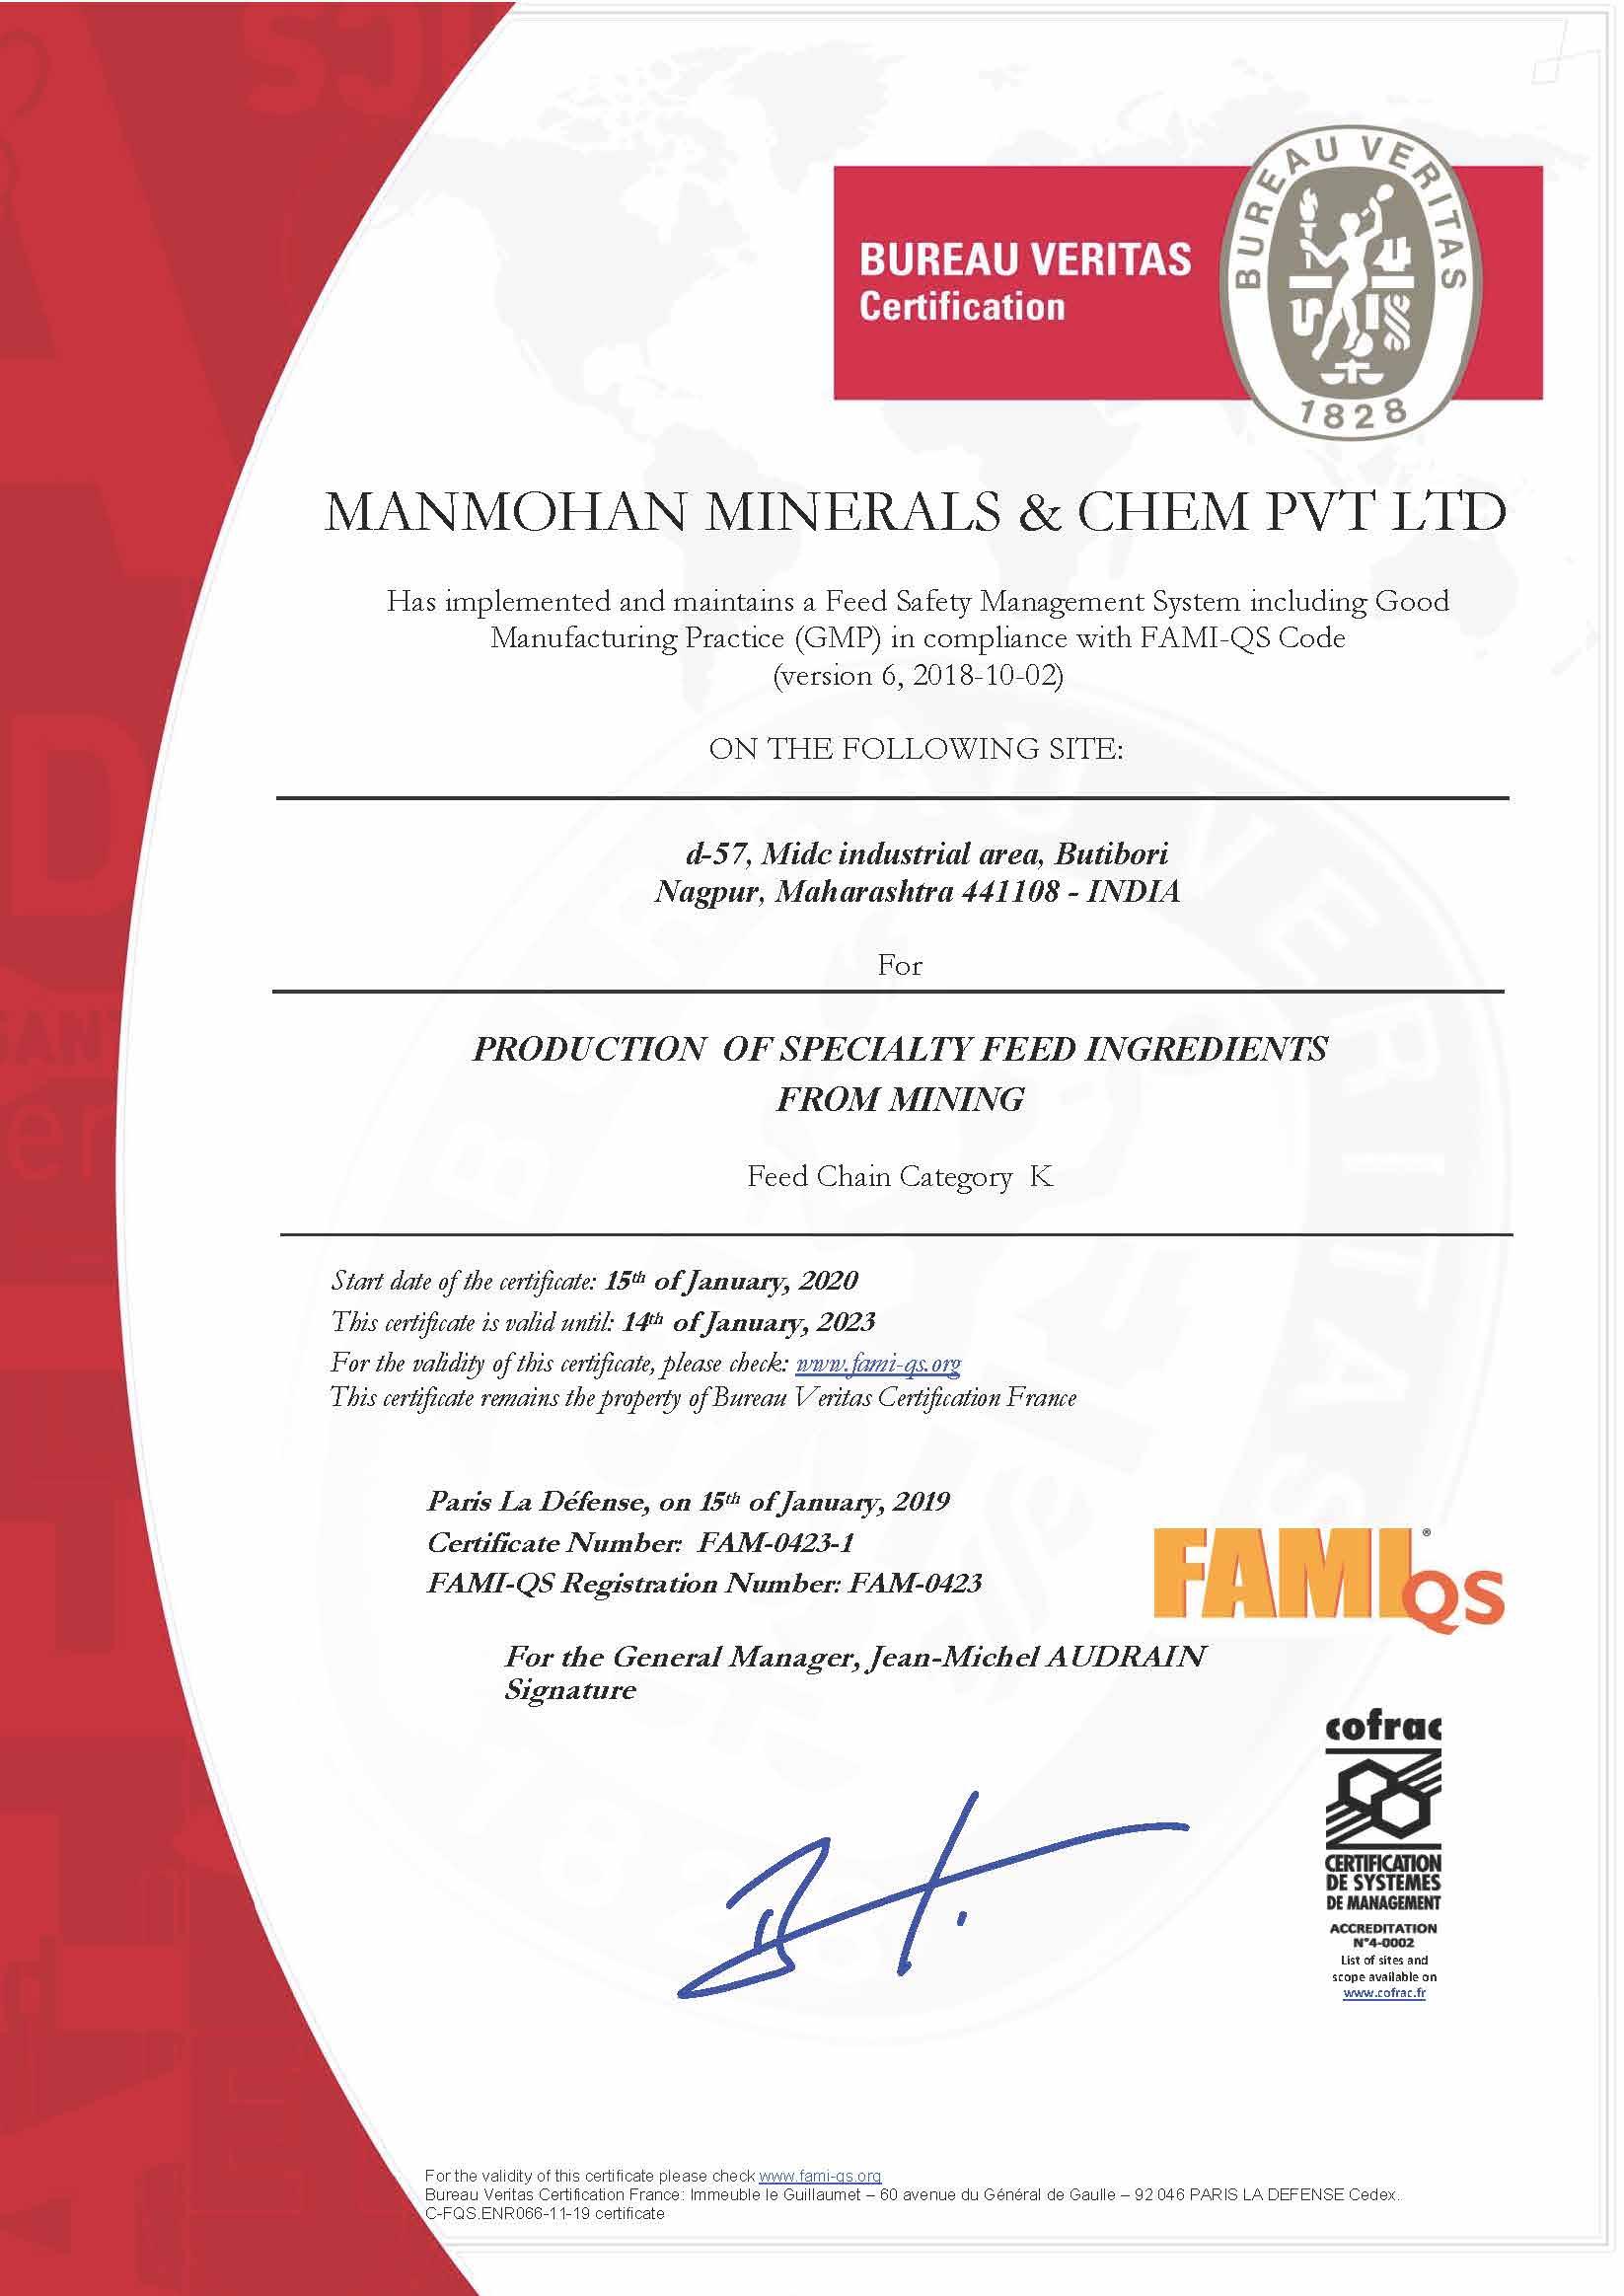 FAMI-QS CERTIFICATE 2020-2023